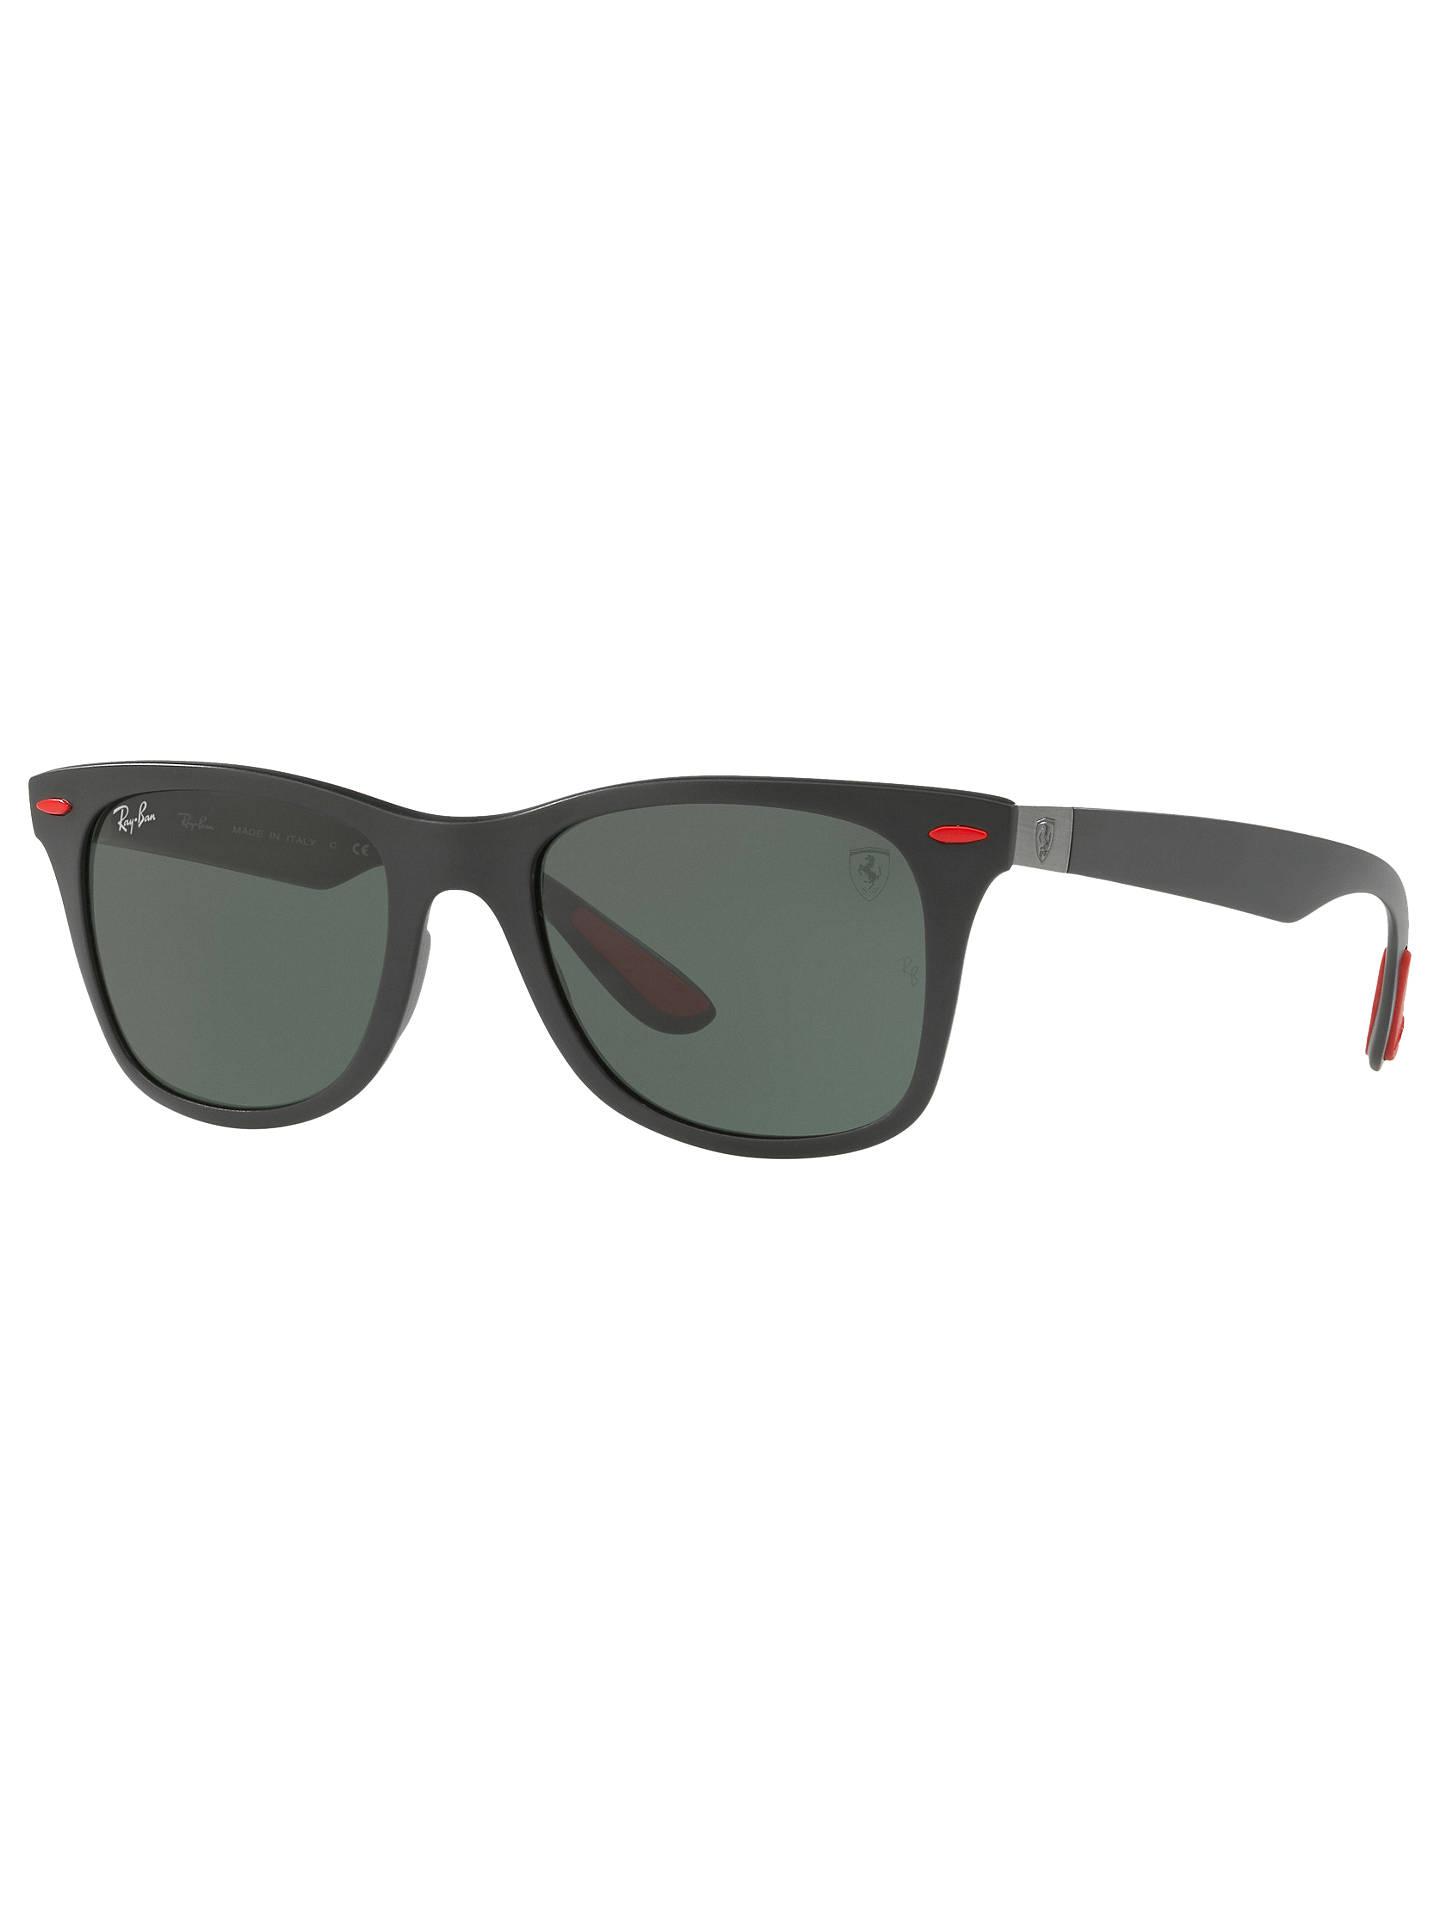 8a4aa42ac35 Buy Ray-Ban RB4195M Scuderia Ferrari Wayfarer Sunglasses